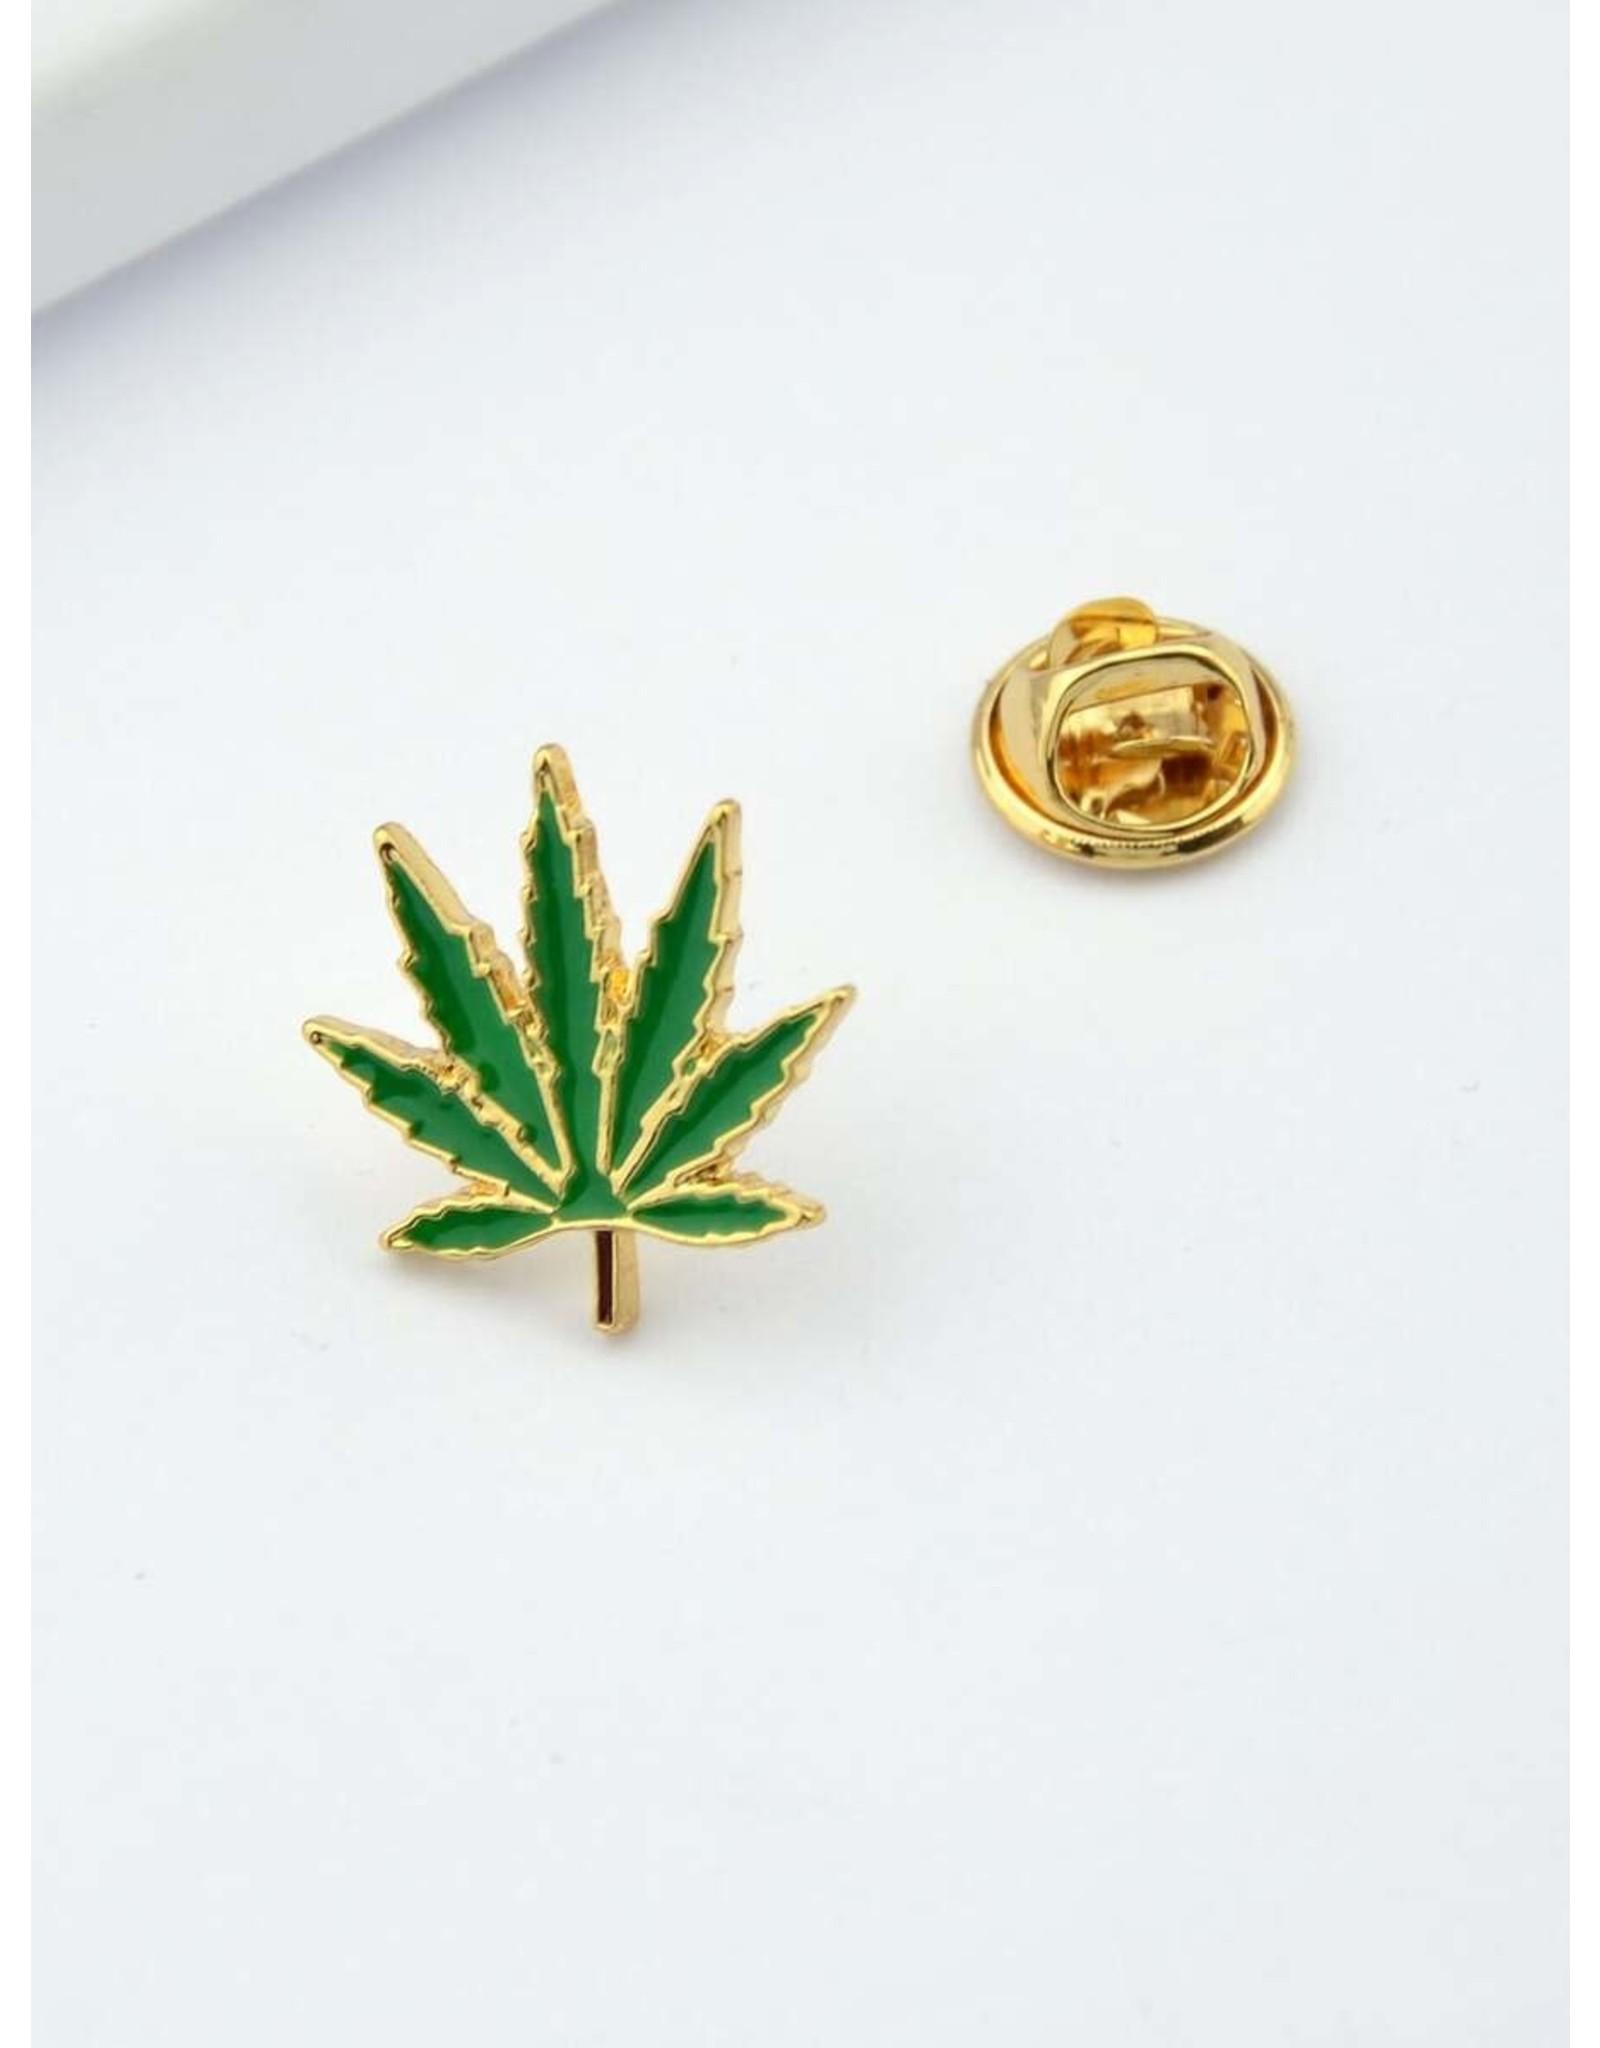 Shein Pin - Pot Leaf - Weed